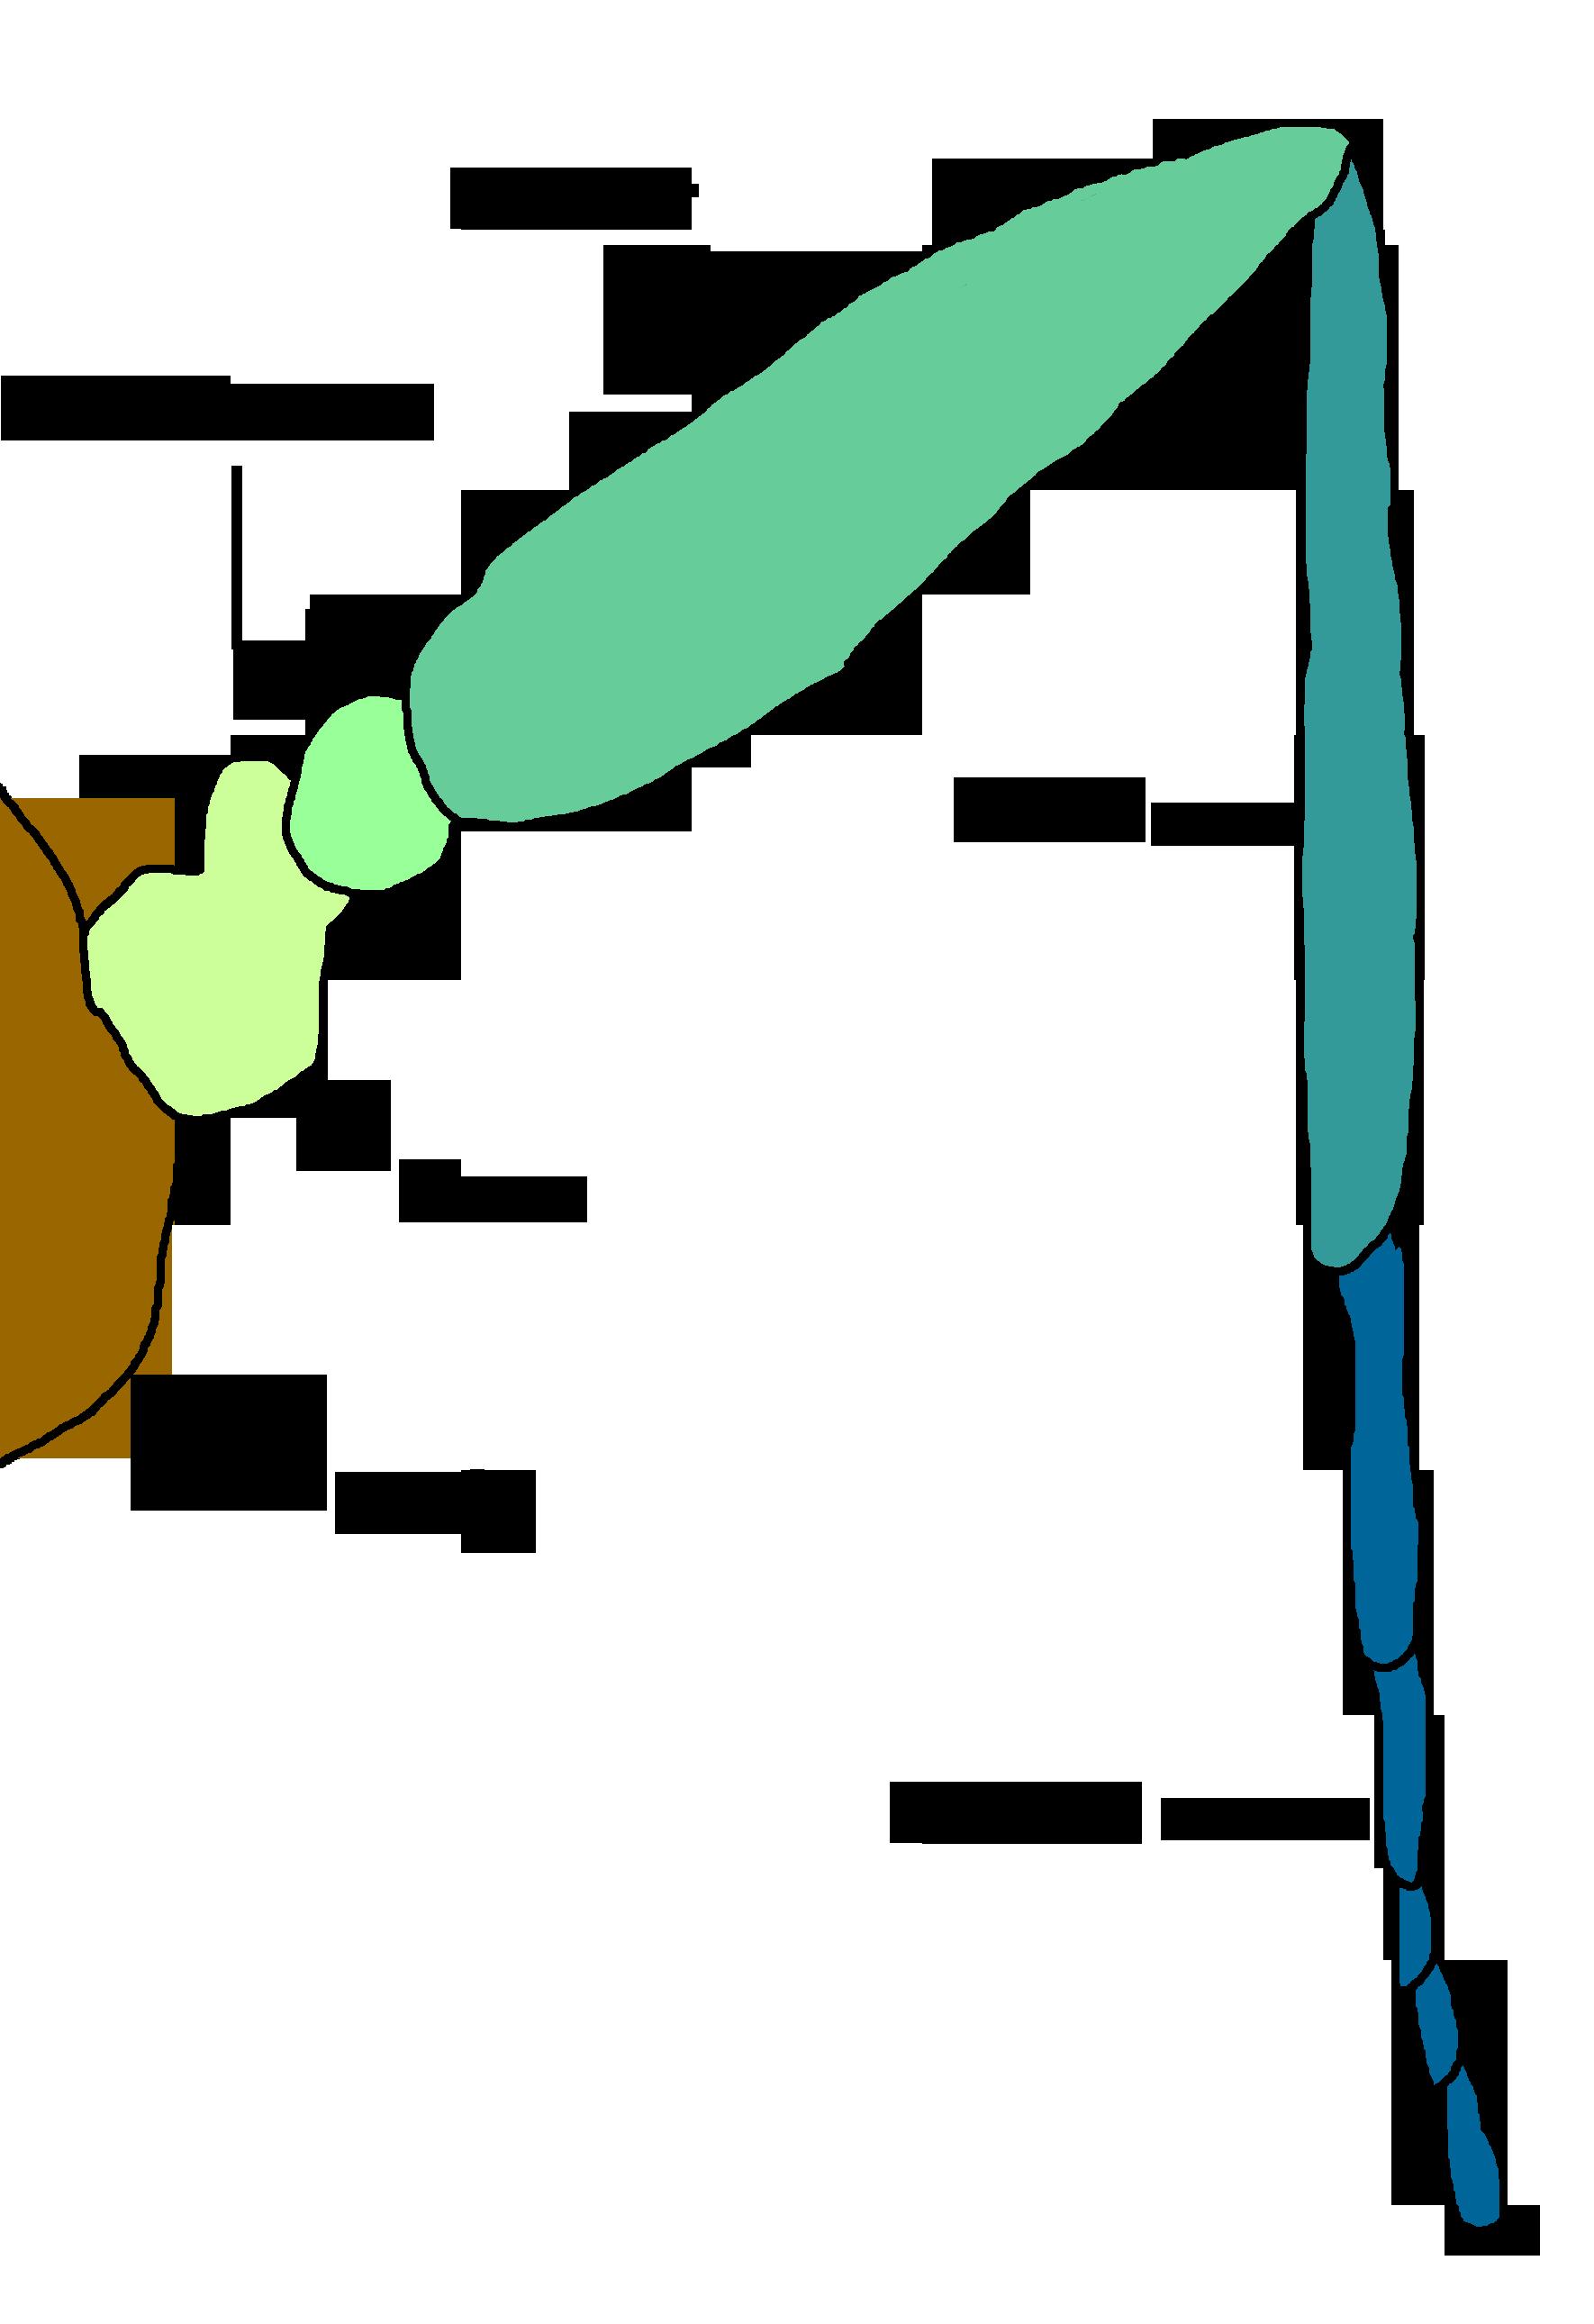 Grasshopper Diagram